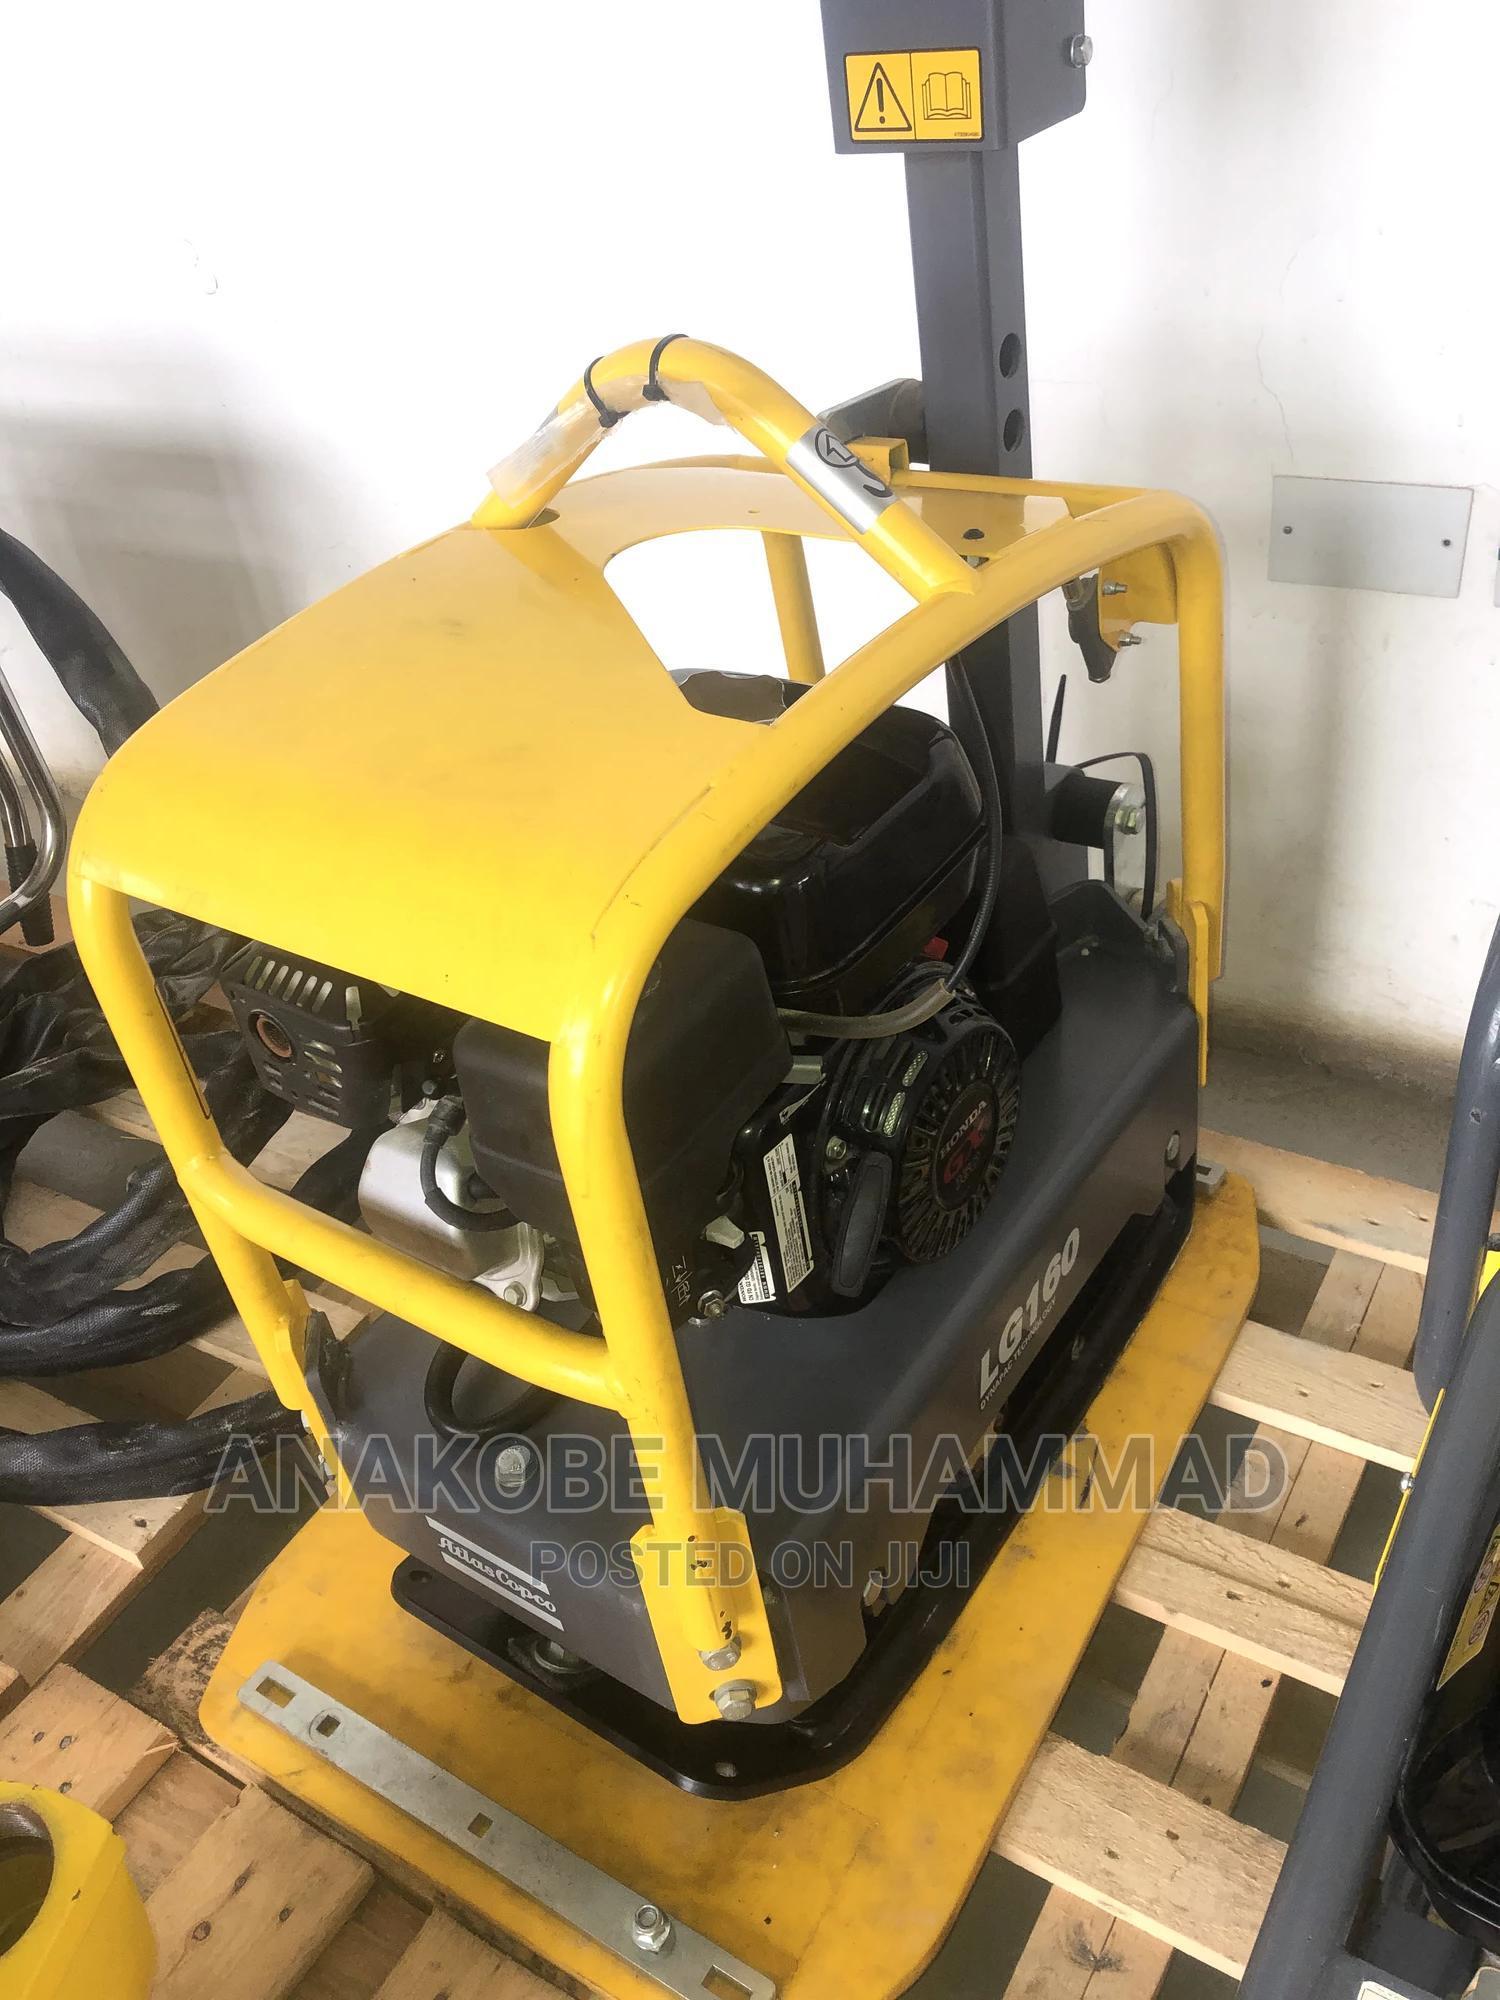 160kg Forward Reversible Plate Compactor 2017